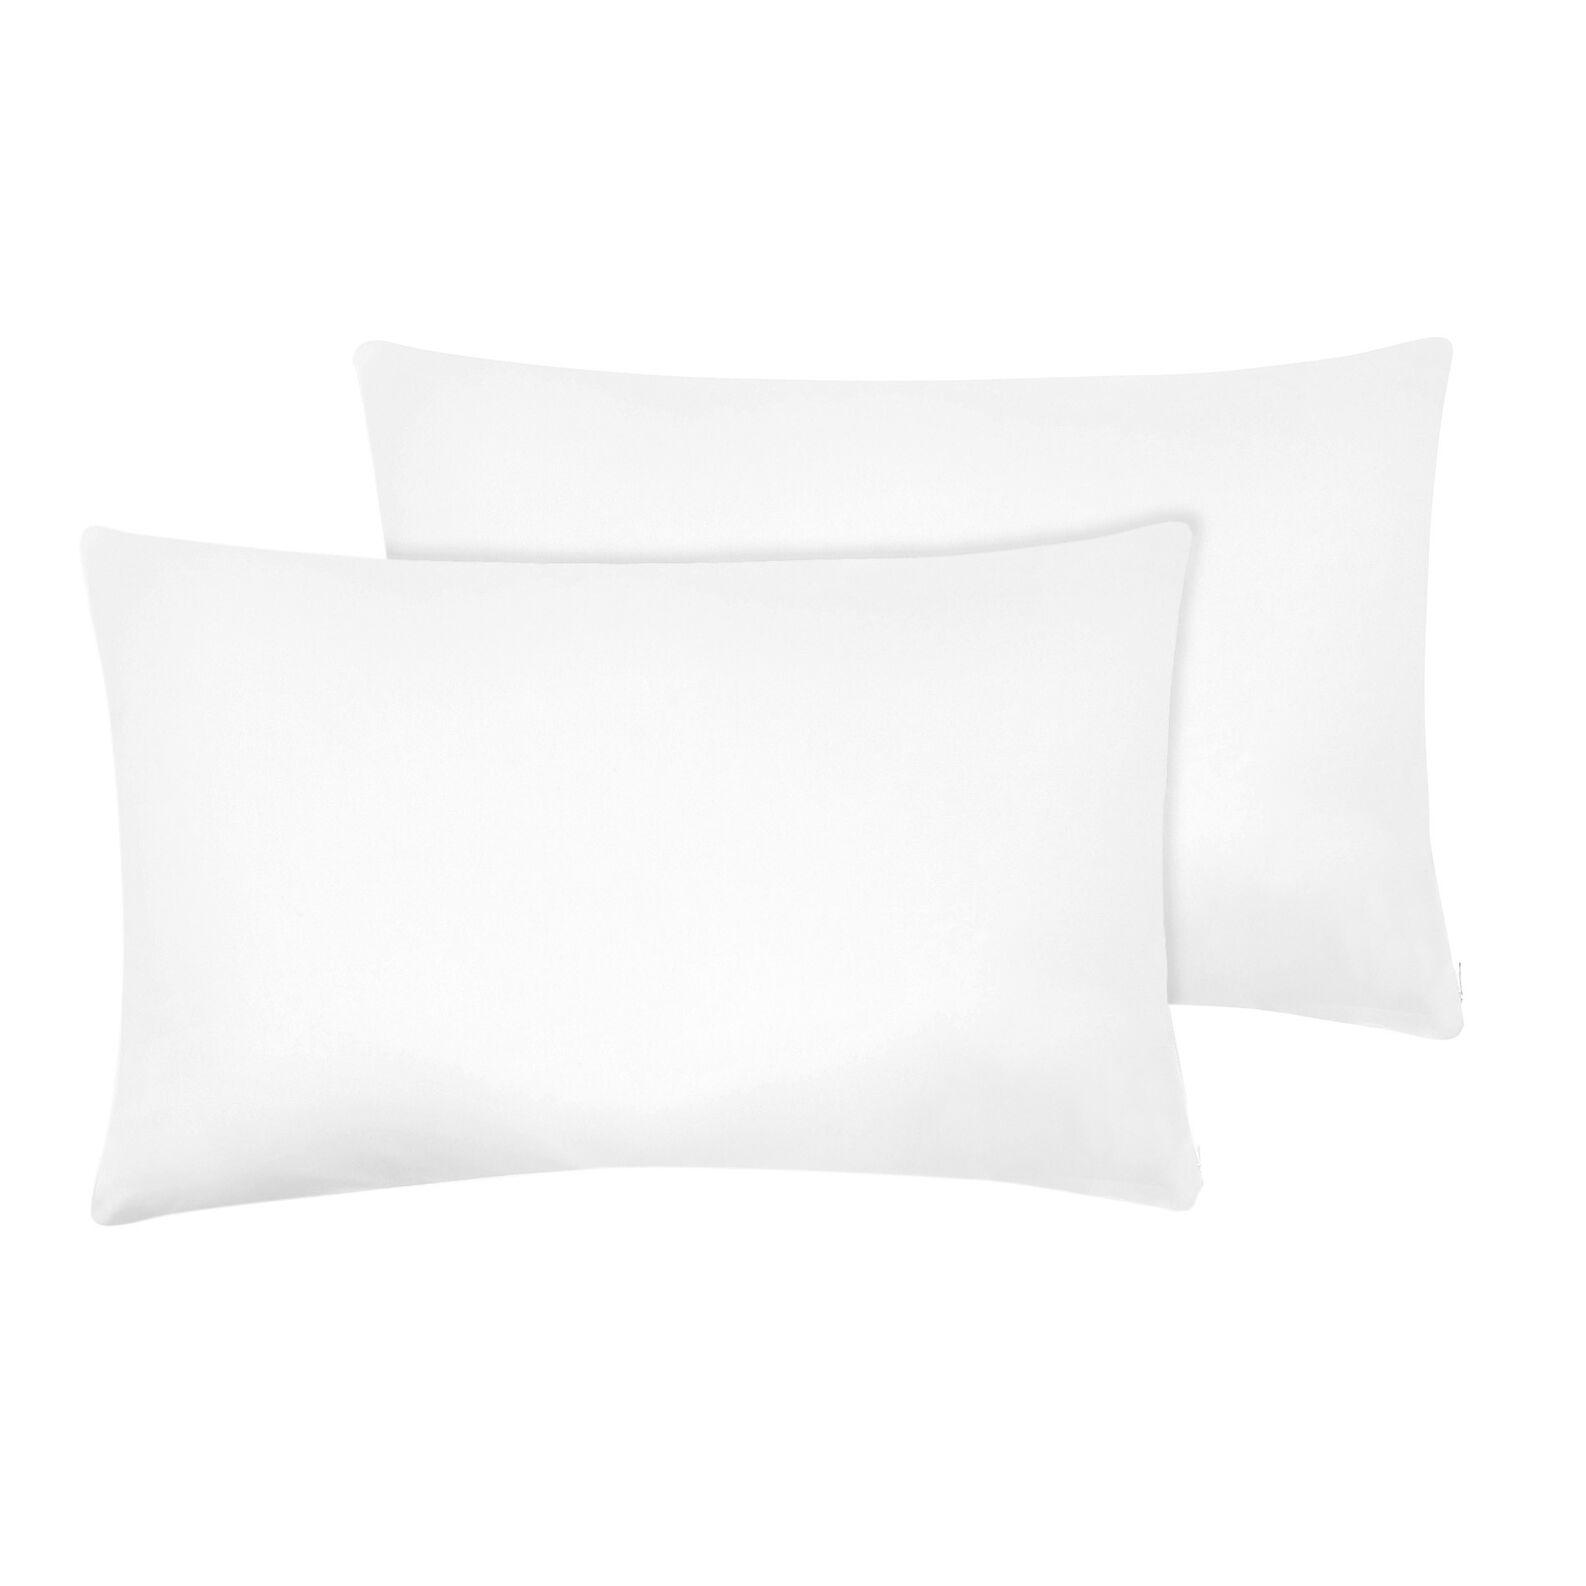 Pair of 100% cotton pillows